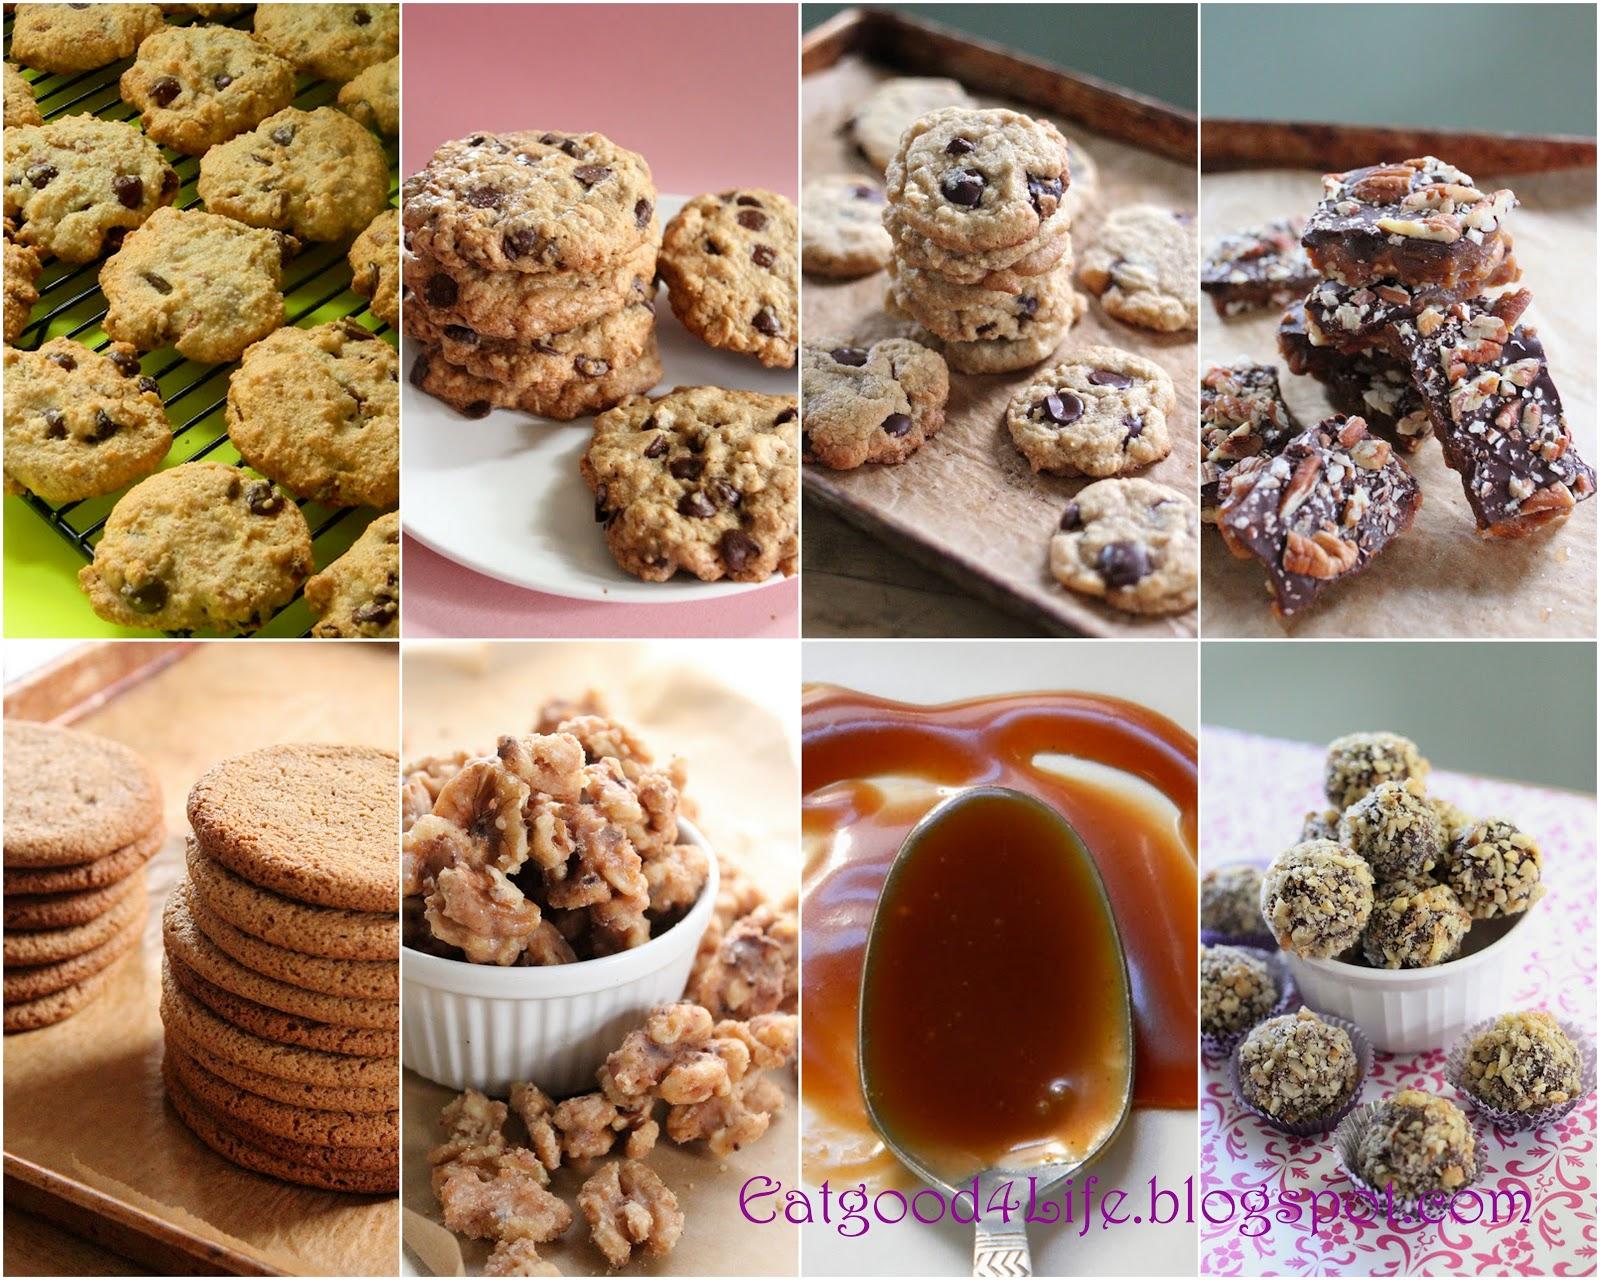 My Top 16 Christmas gift baking ideas | Eat Good 4 Life